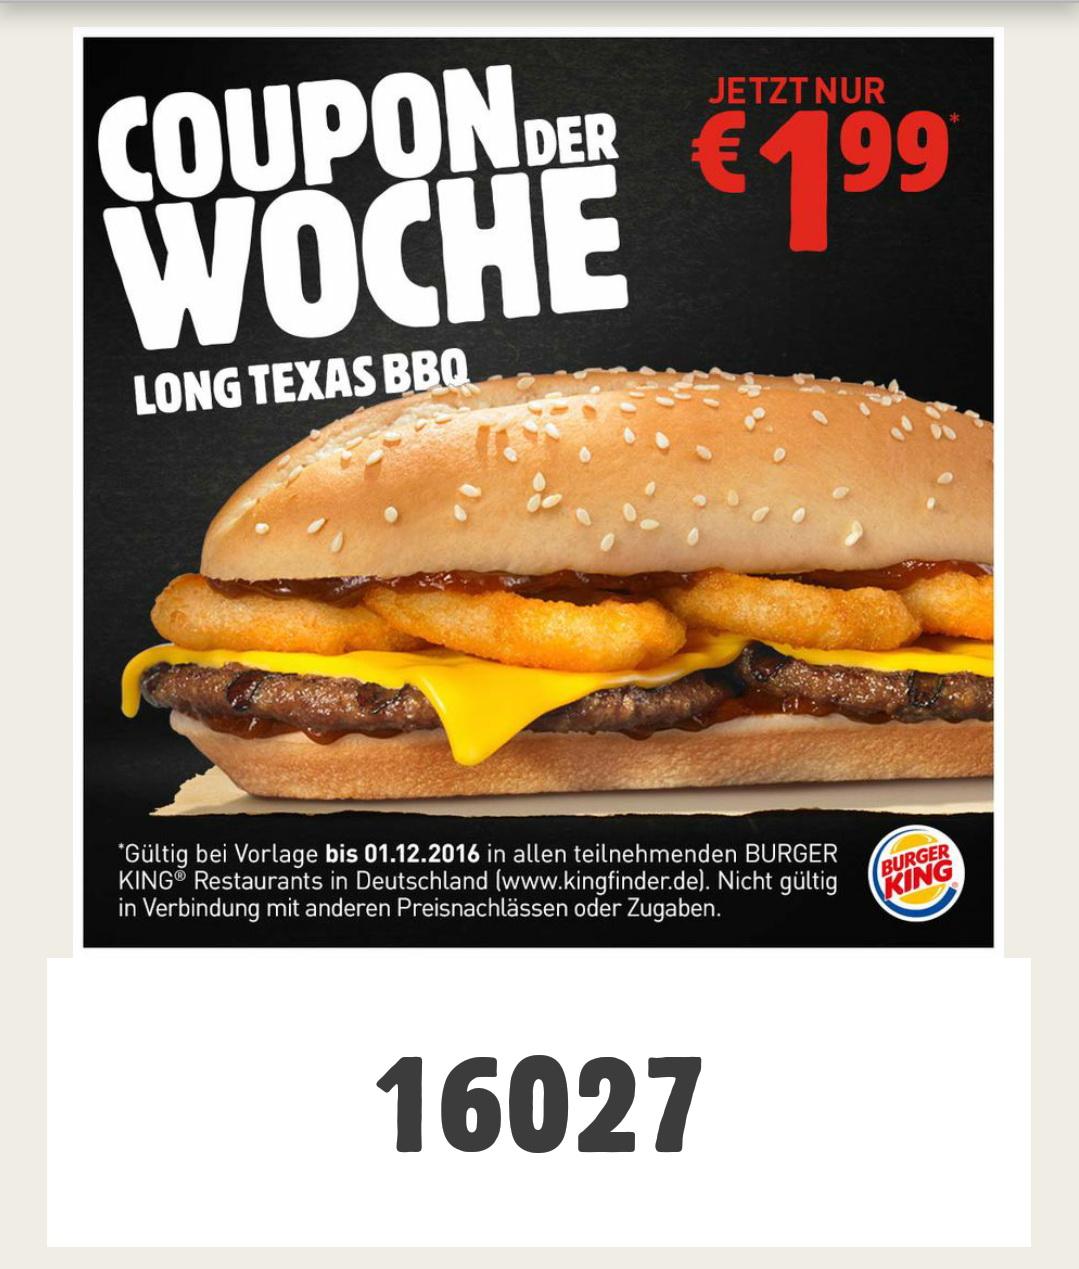 [Burger King App] Long Texas BBQ für 1,99€